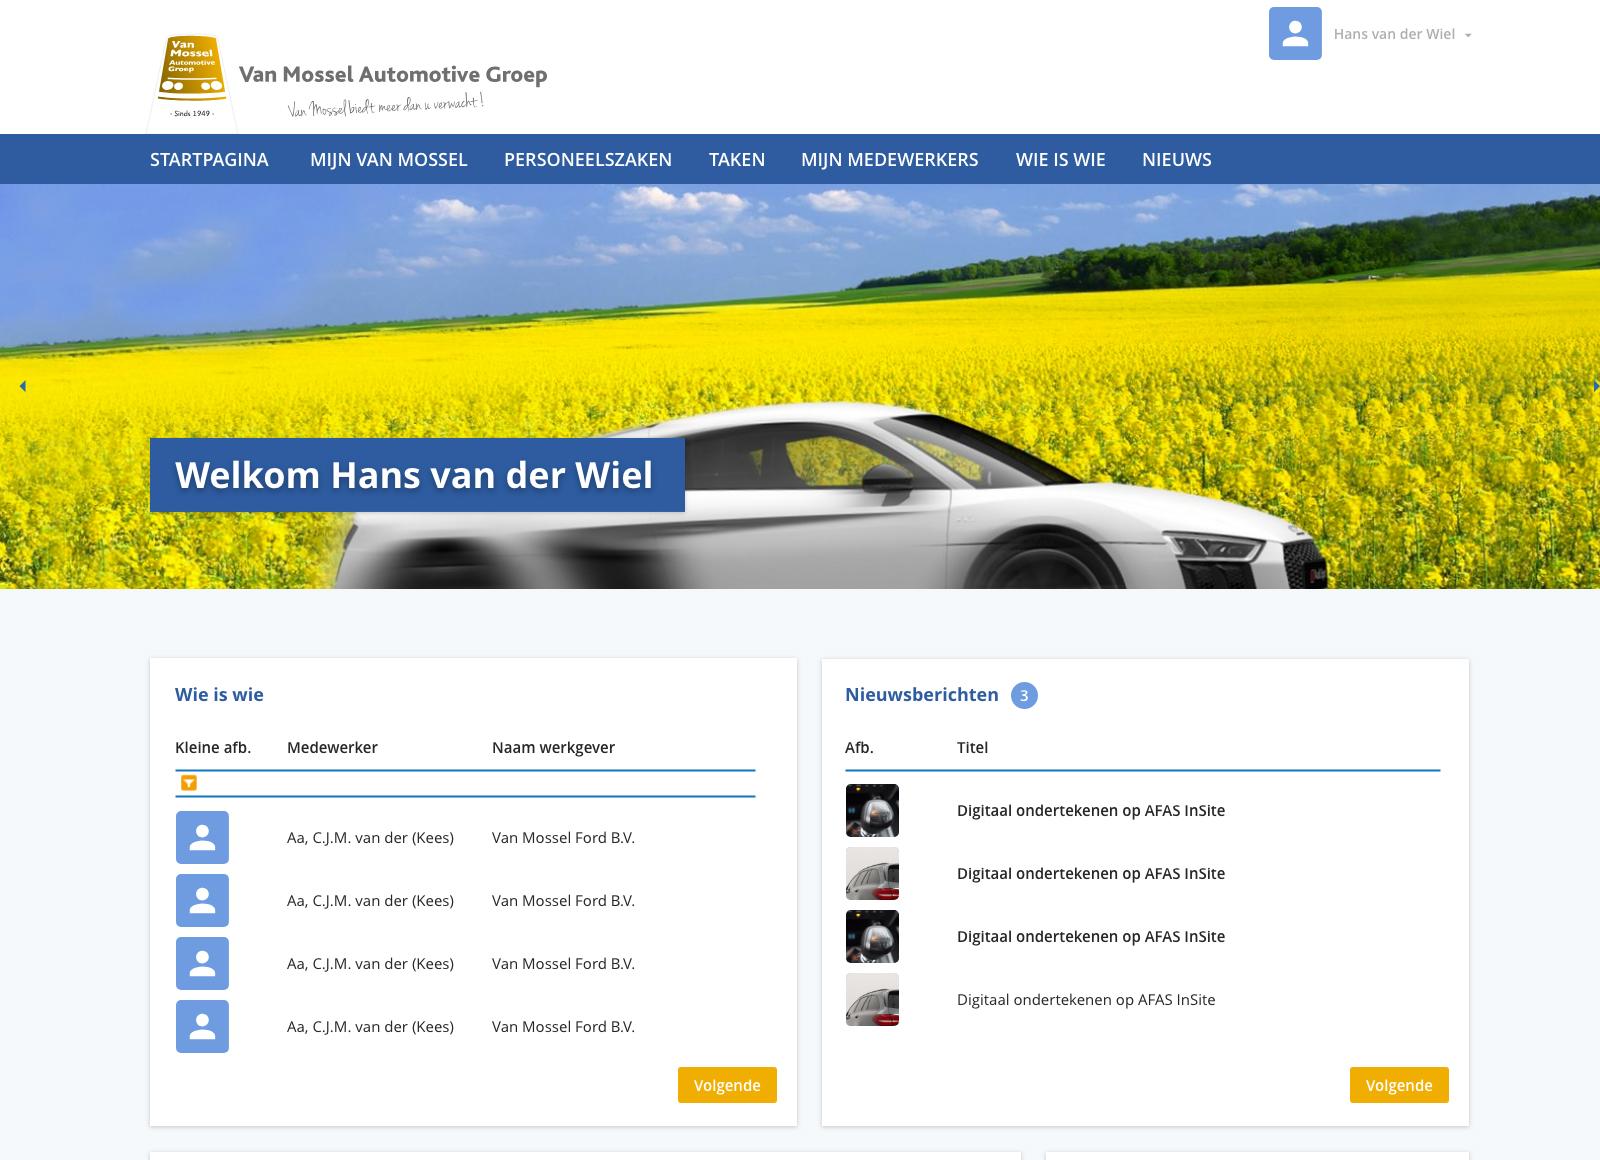 Van Mossel Automotive GroepAFAS InSite case